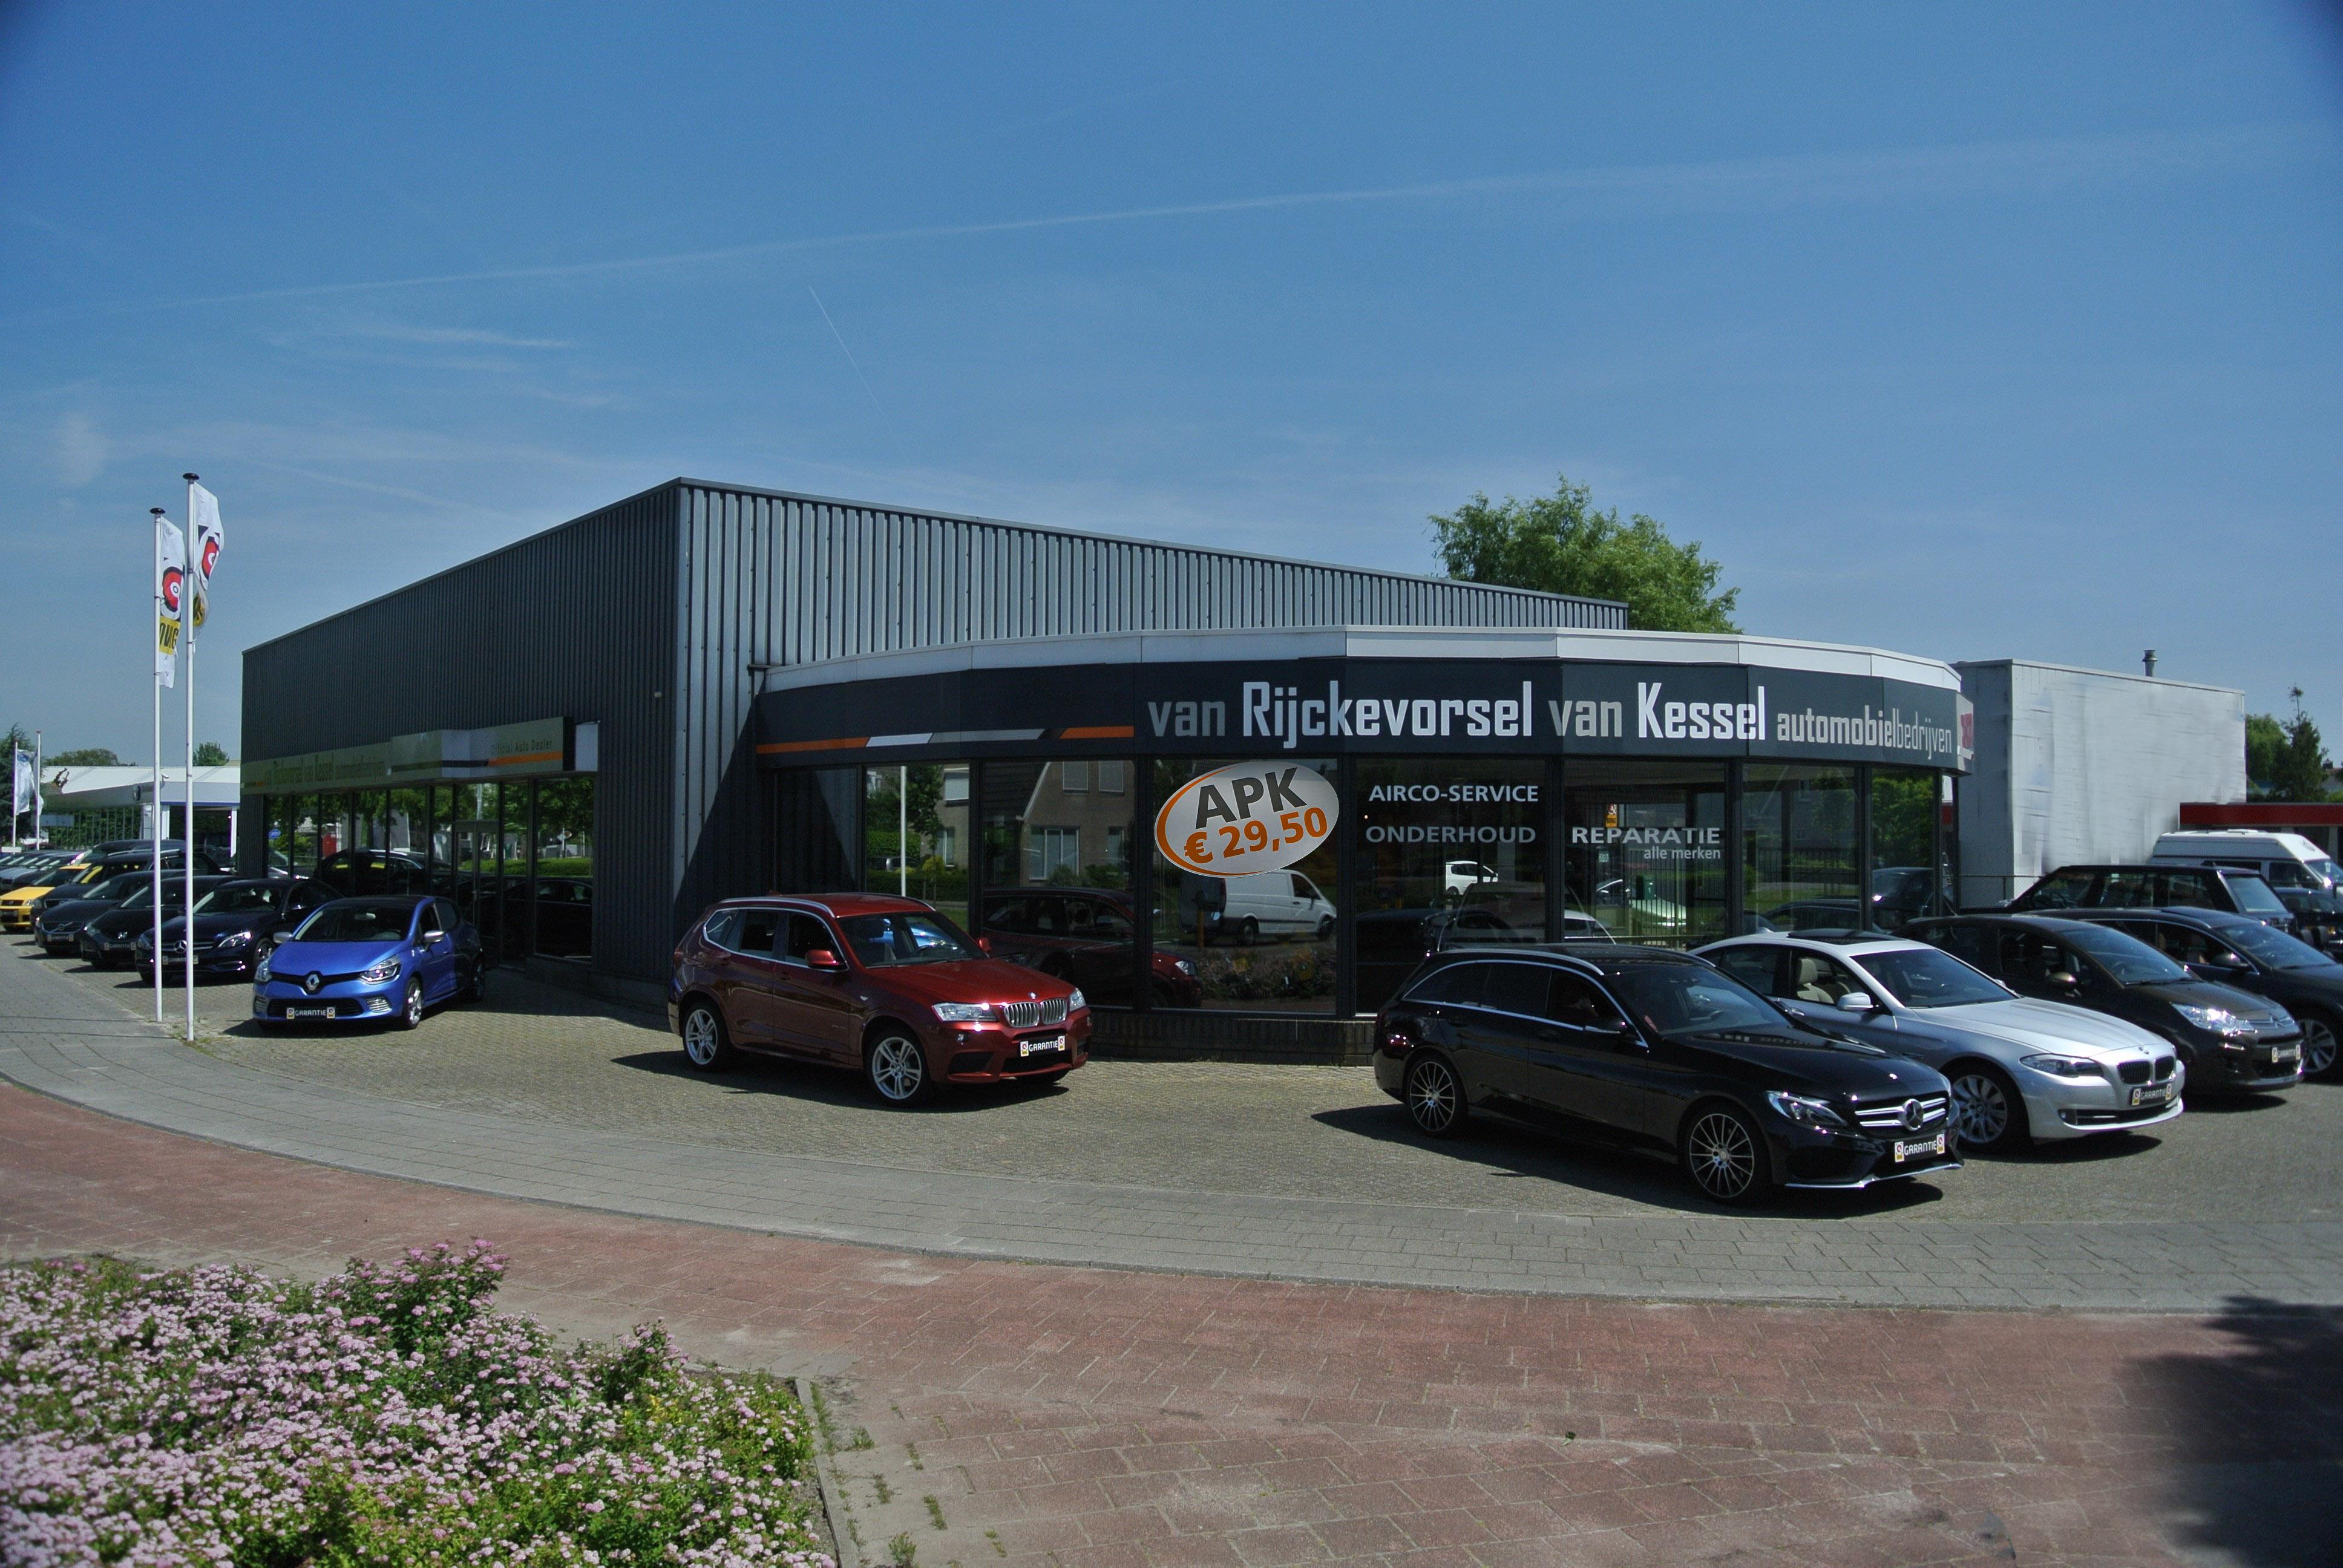 Van Rijckevorsel Van Kessel Automobielen Zuidrand 1 4761ZZ Zevenbergen